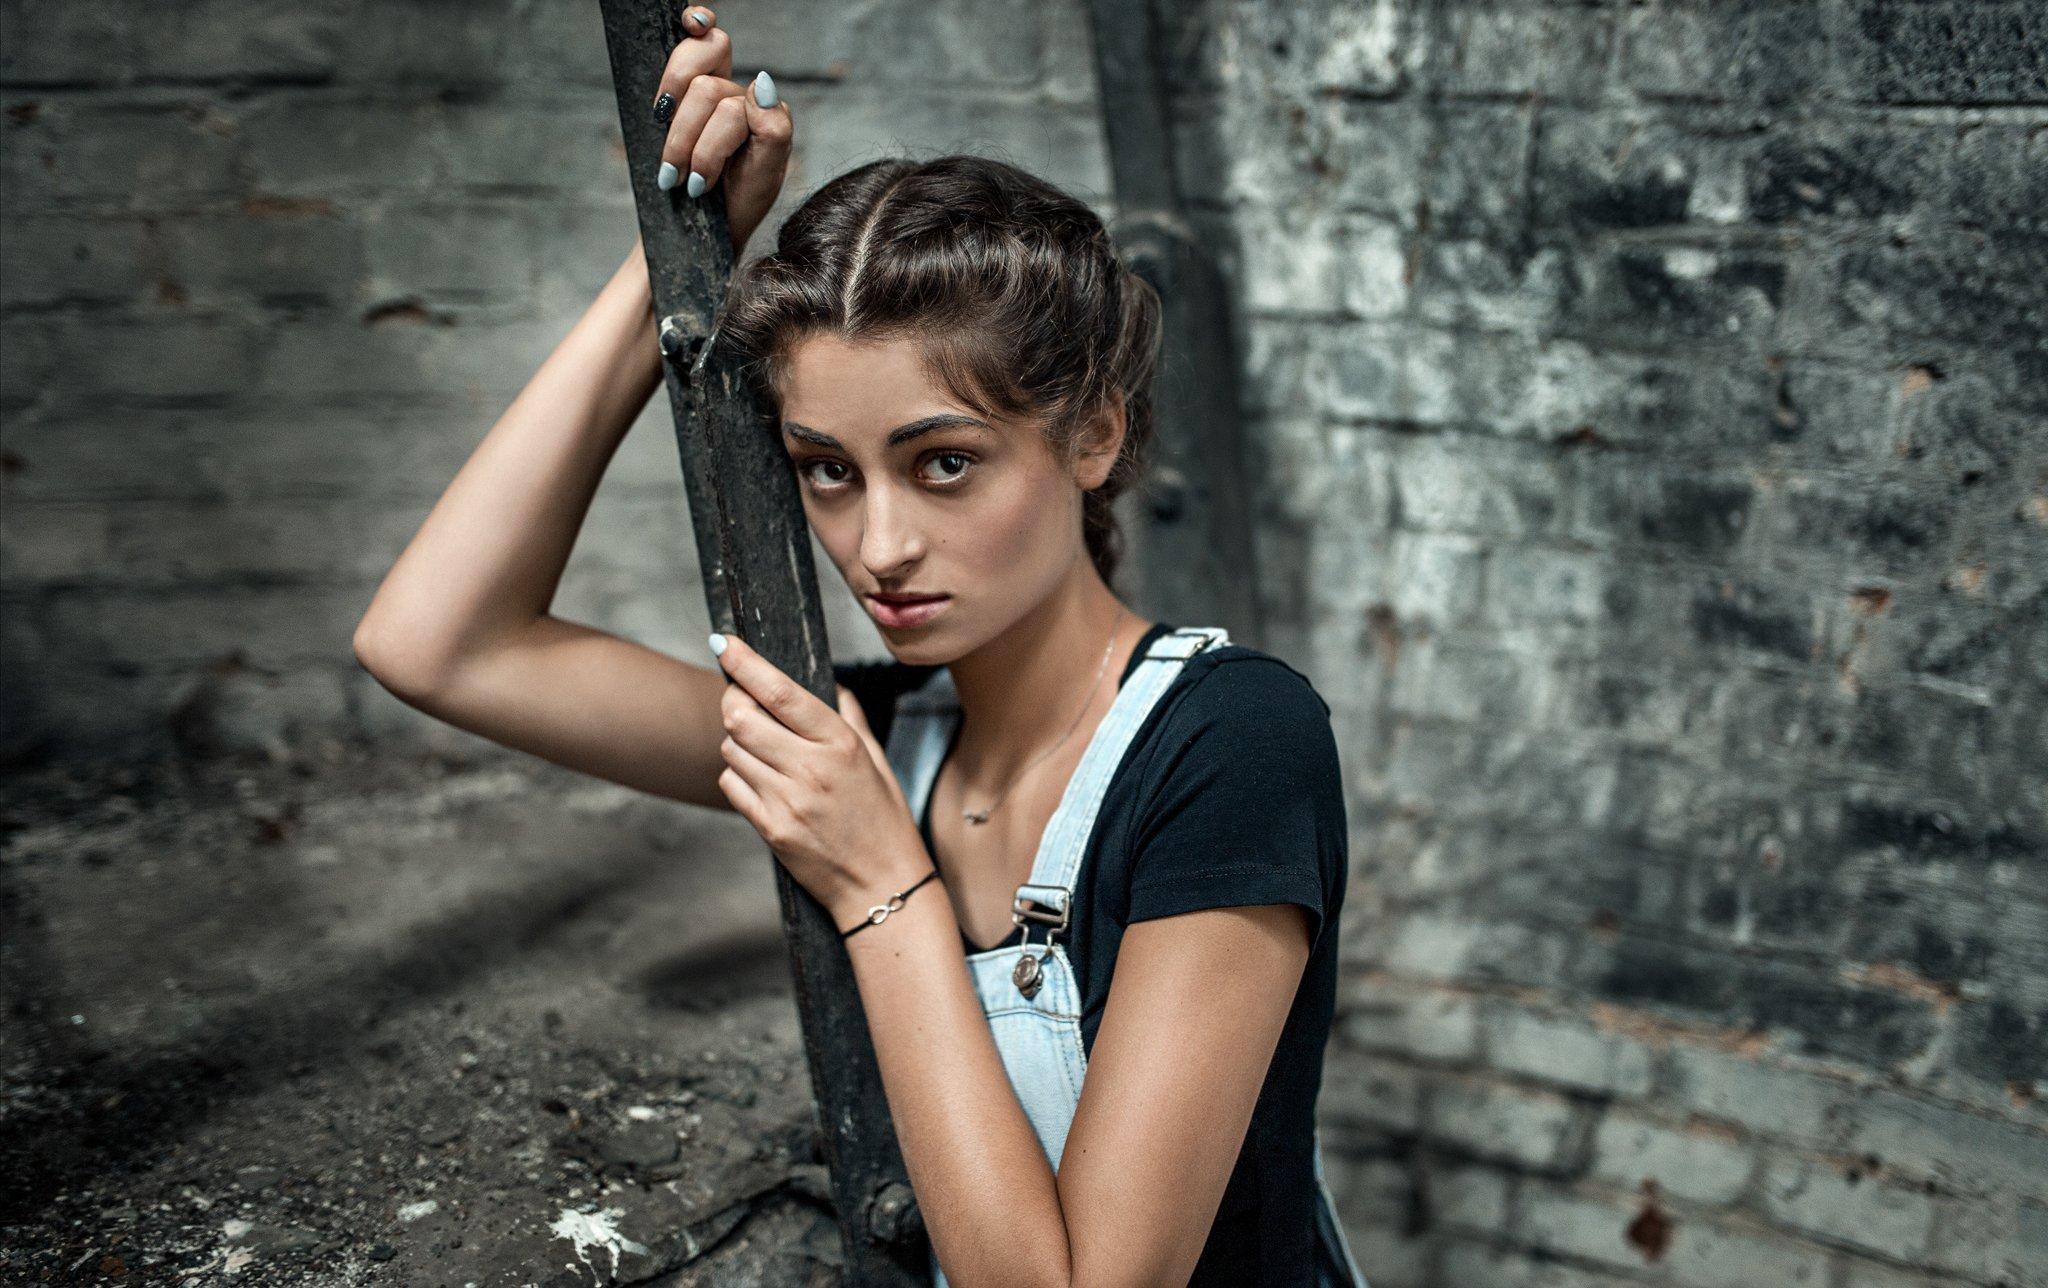 Color, Girl, Mood, Portrait, Damian Piorko